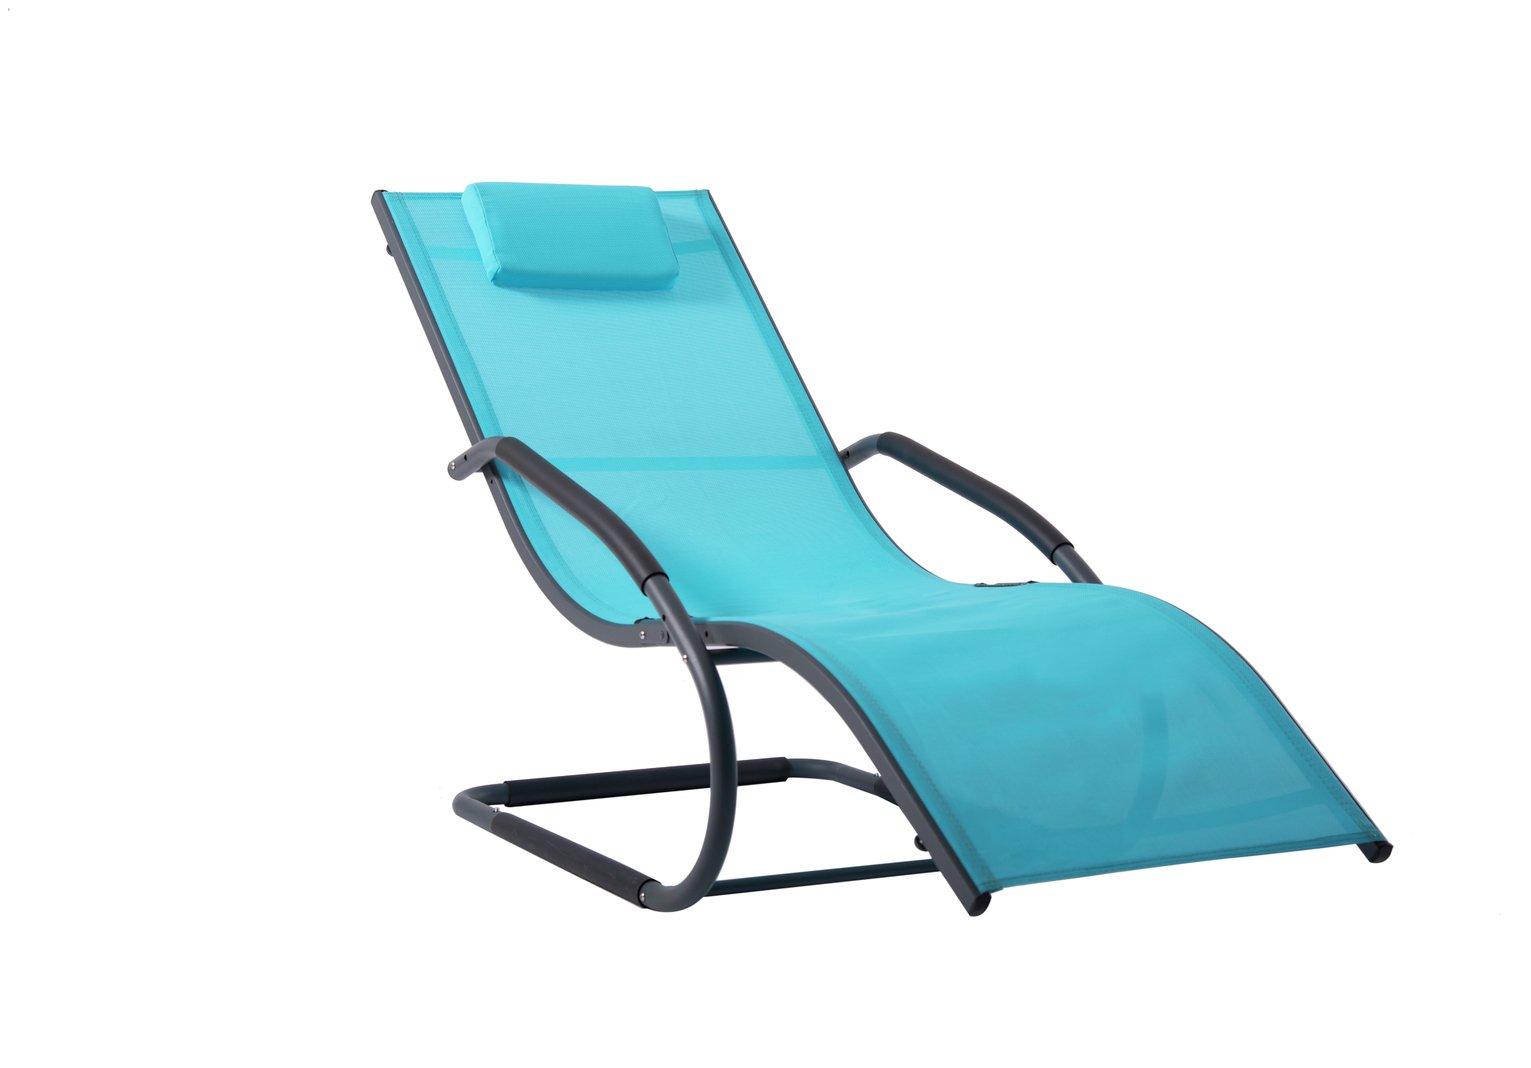 Vivere Wave Metal Sun Lounger - Ocean Blue on Matte Grey